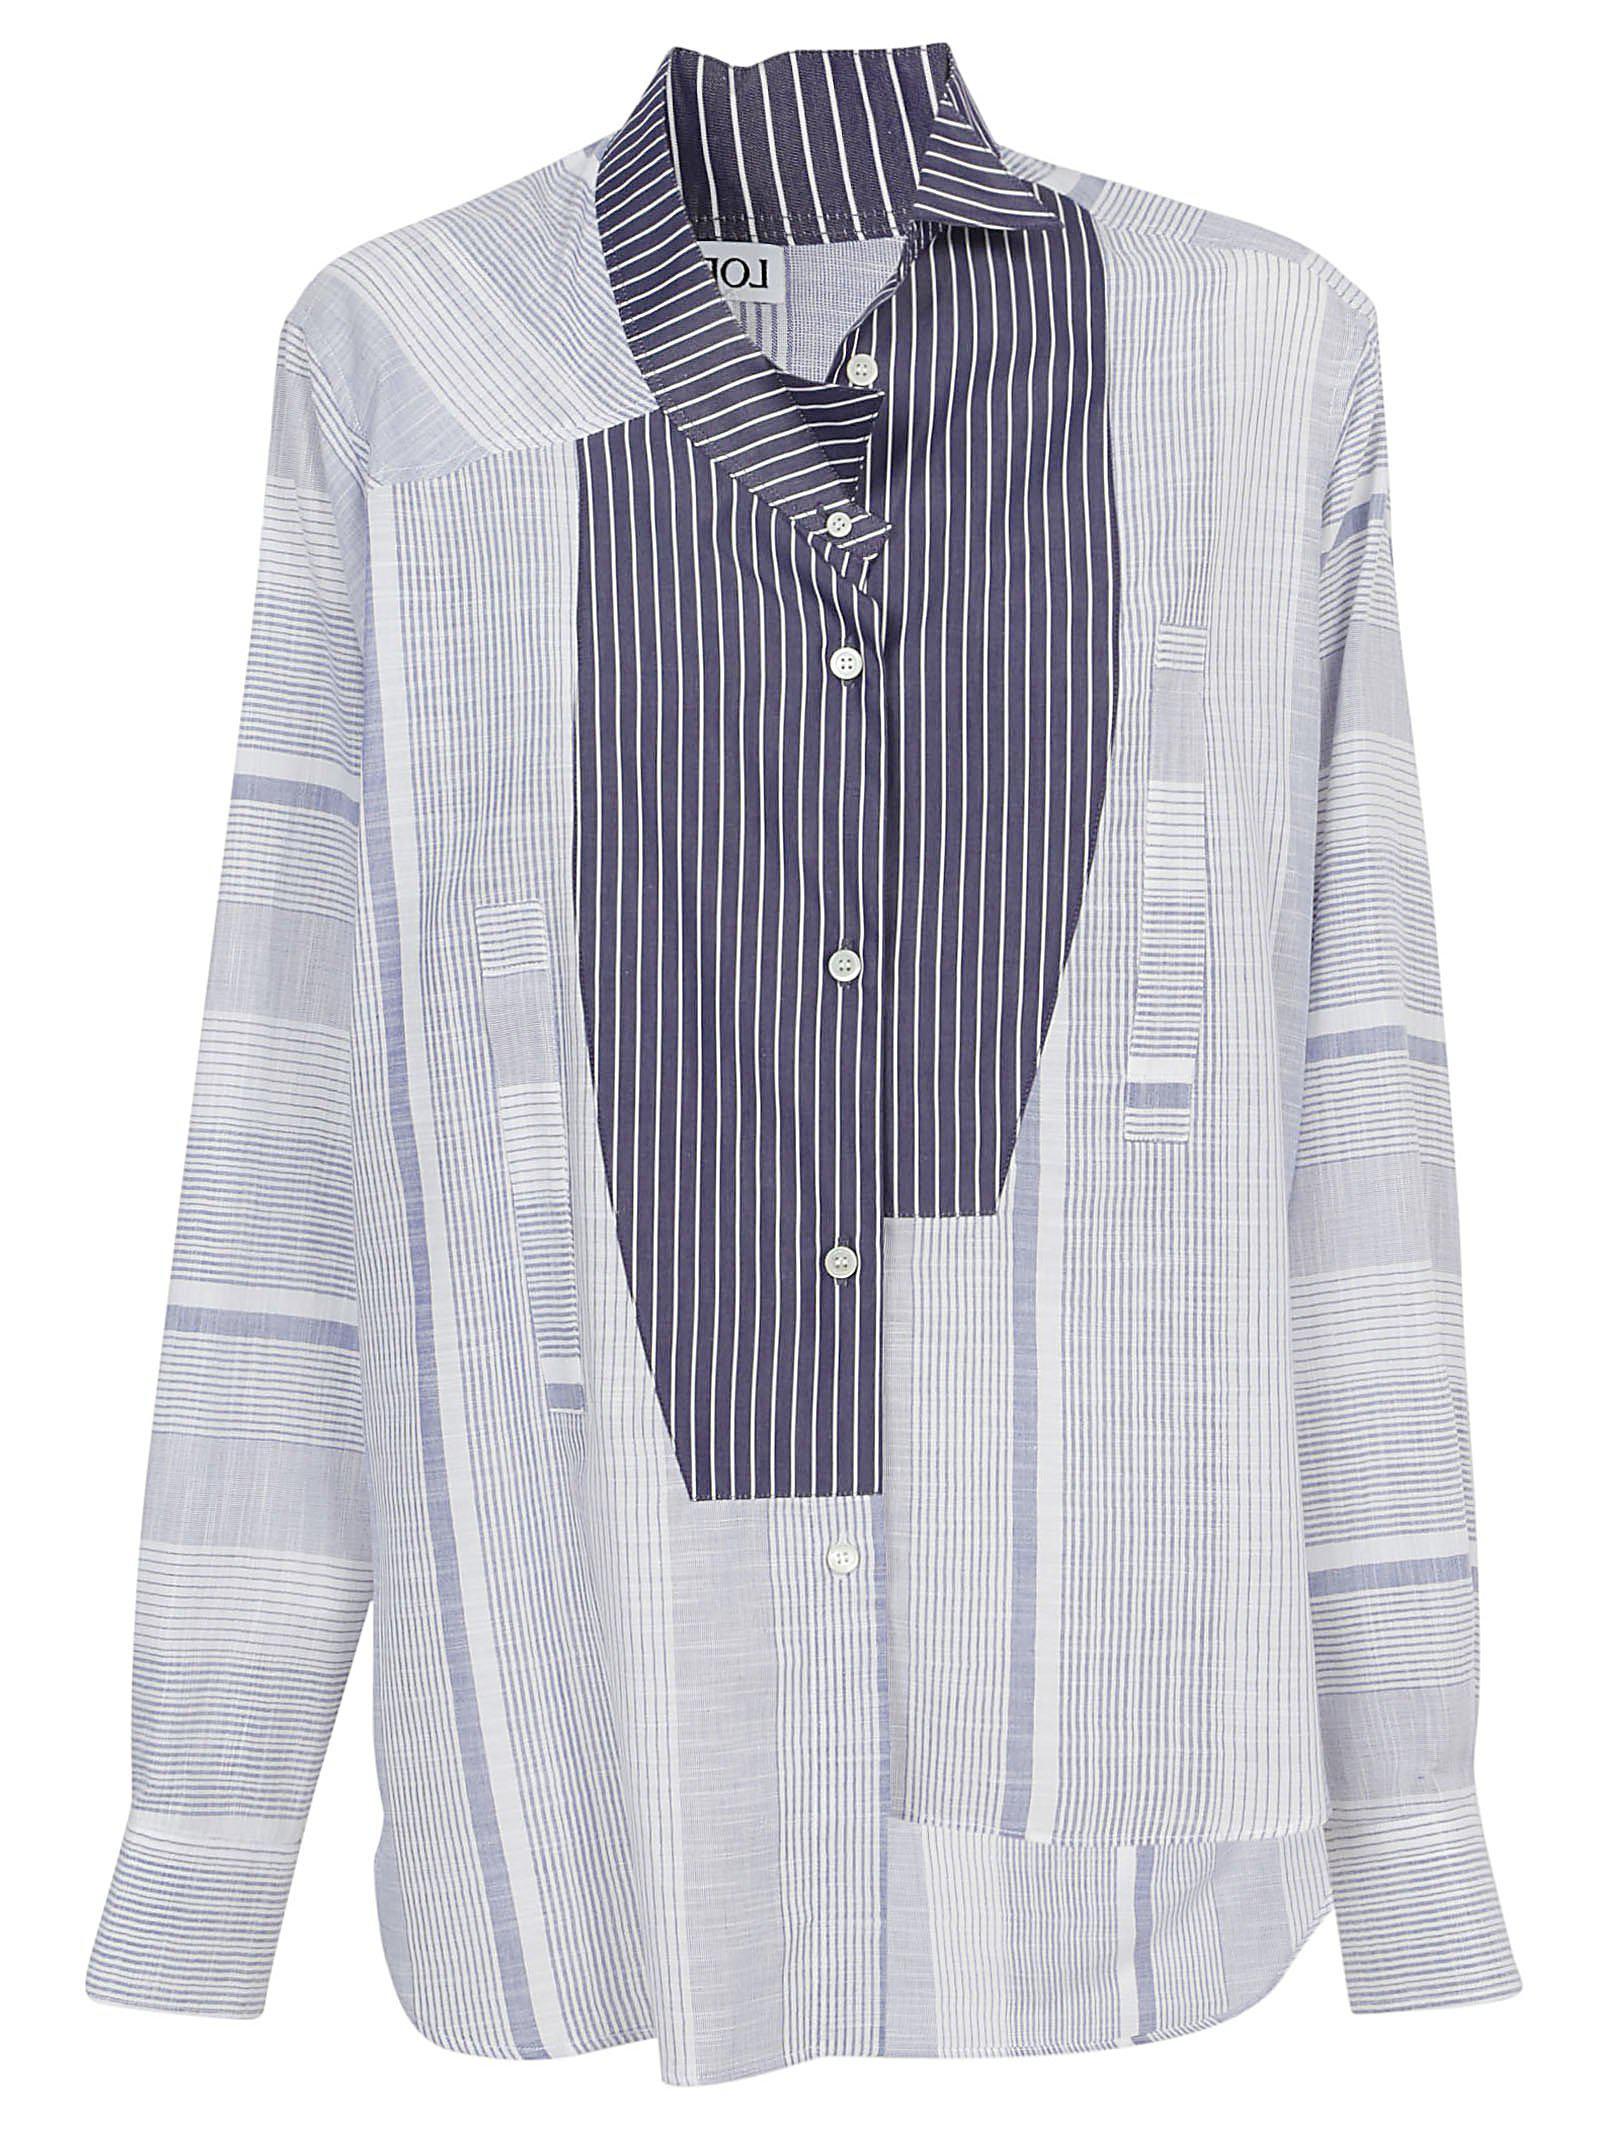 d49343c7 Loewe Contrast Stripe Shirt in Blue for Men - Lyst